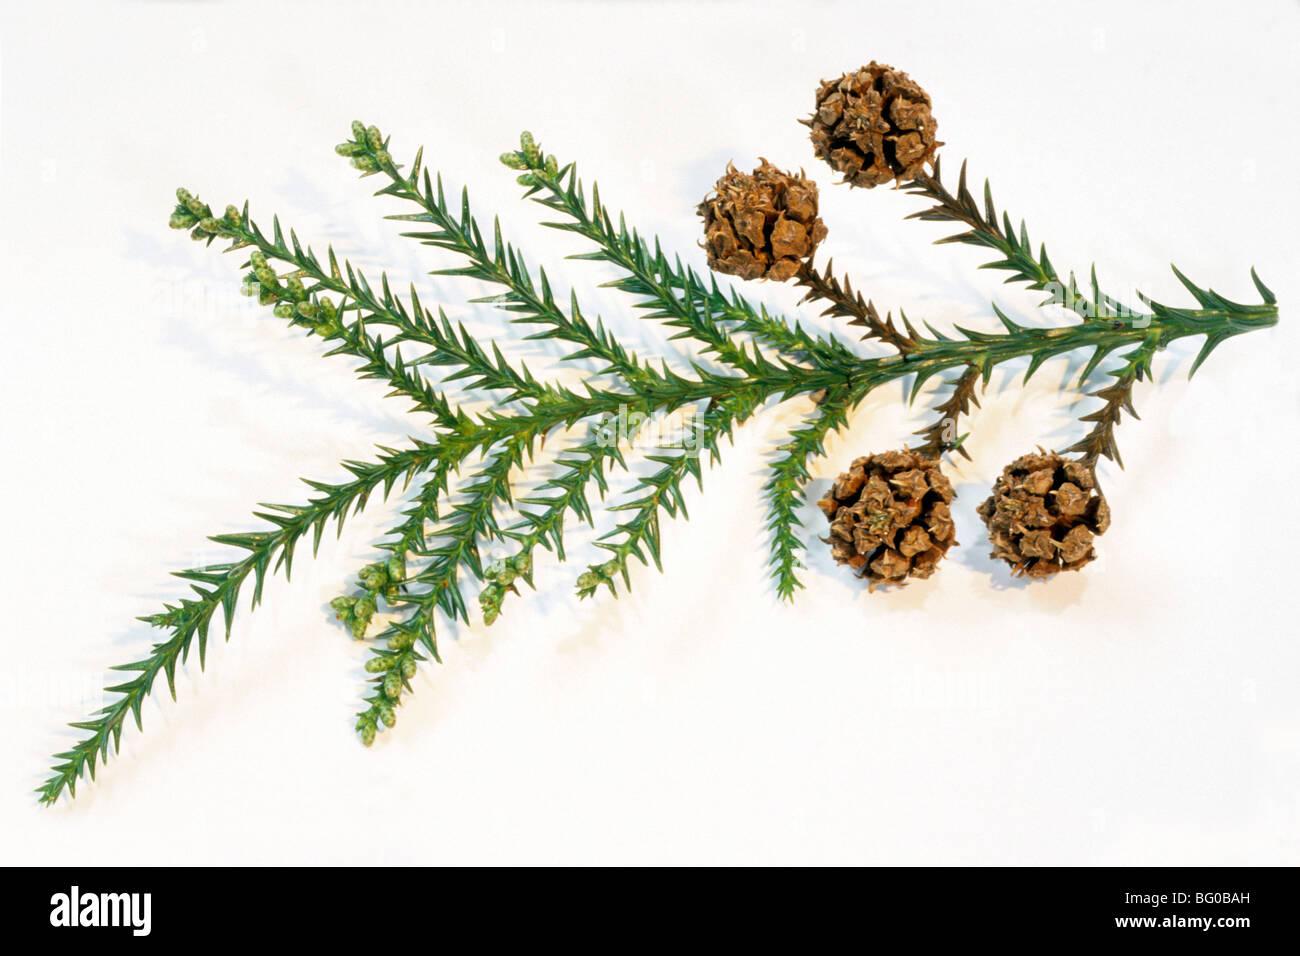 Japanese Cedar (Cryptomeria japonica), twig with cones. - Stock Image